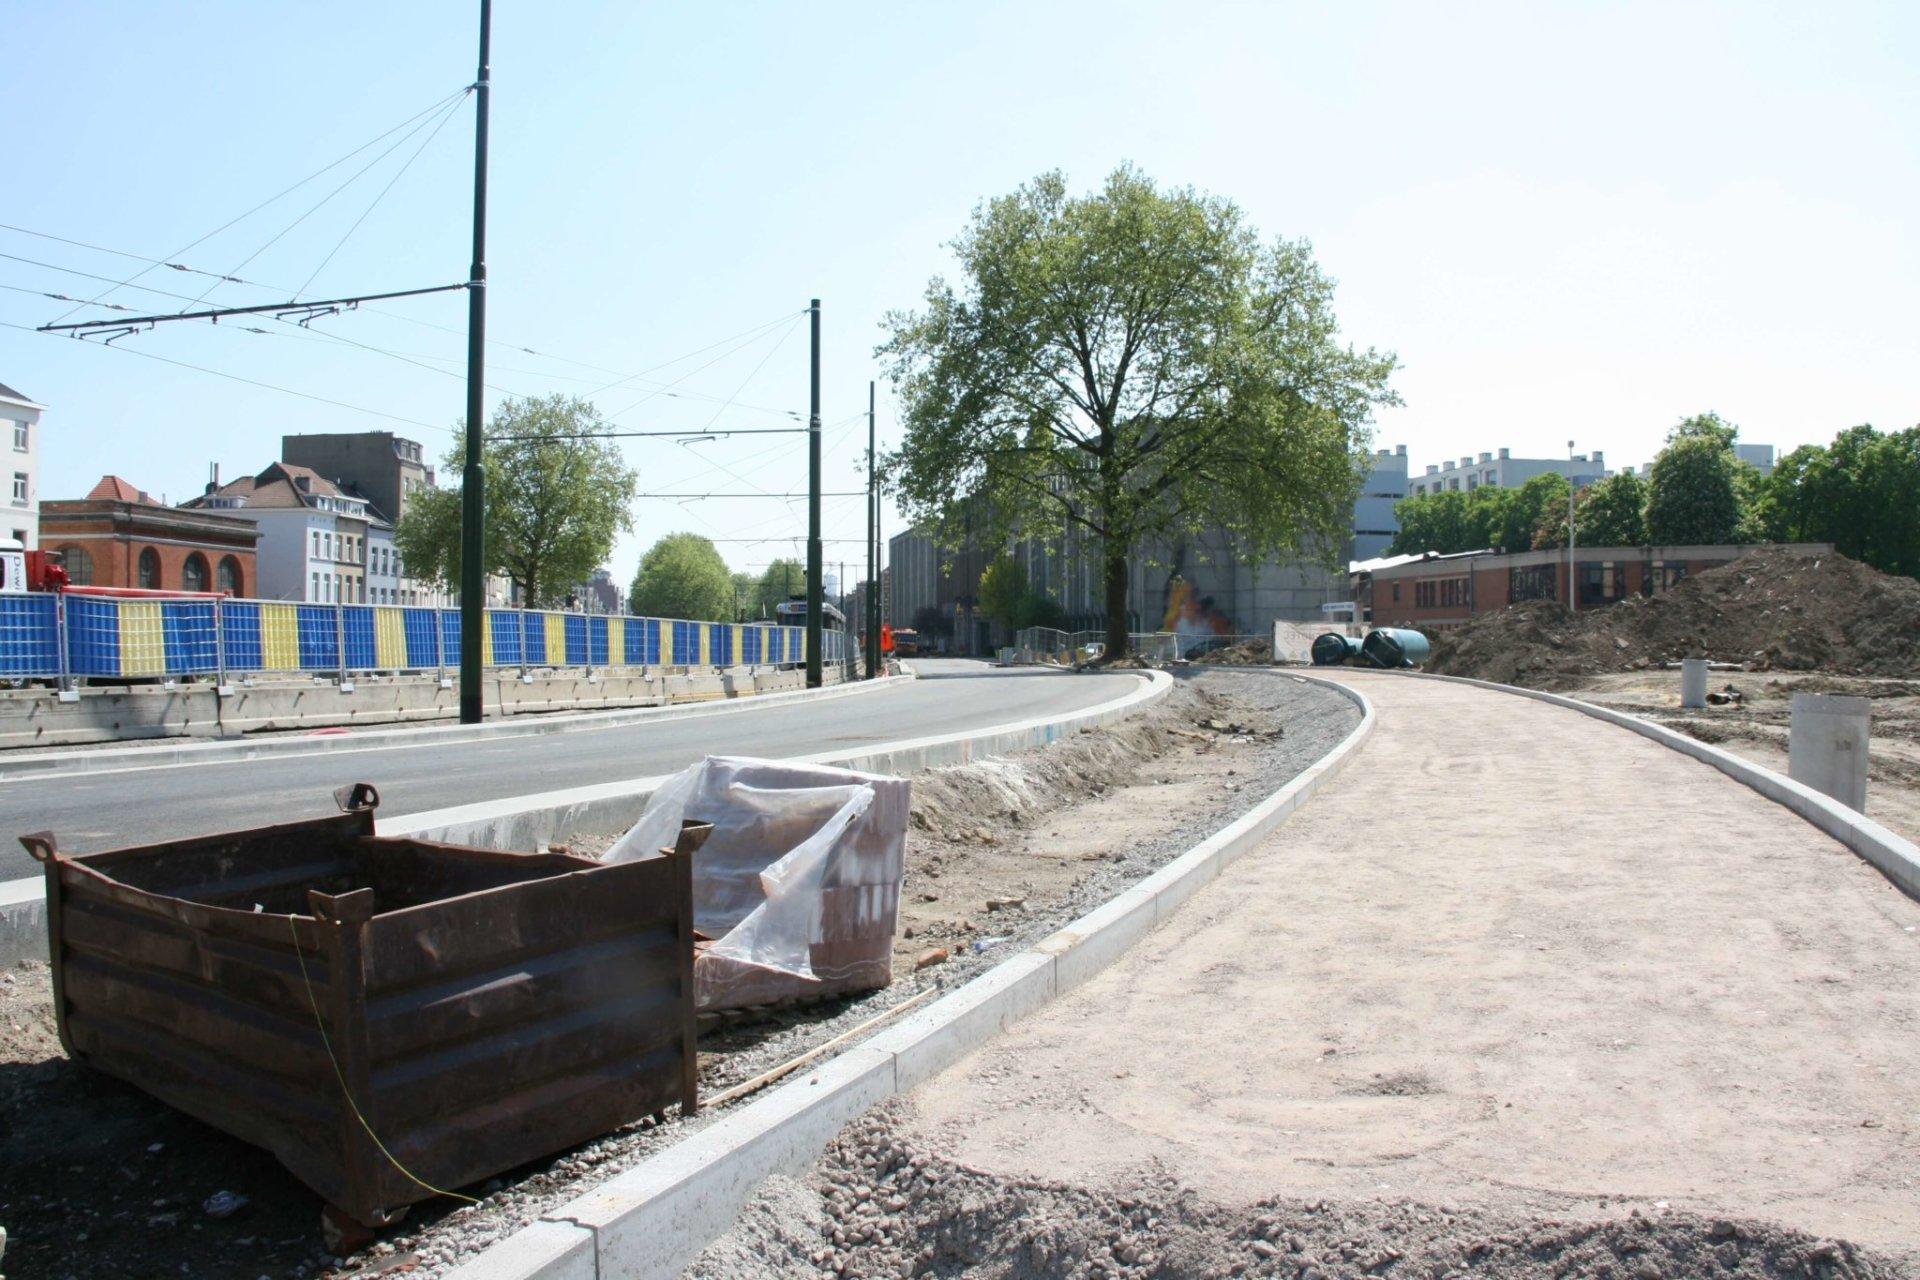 Porte de Ninove Ninoofsepoort 25